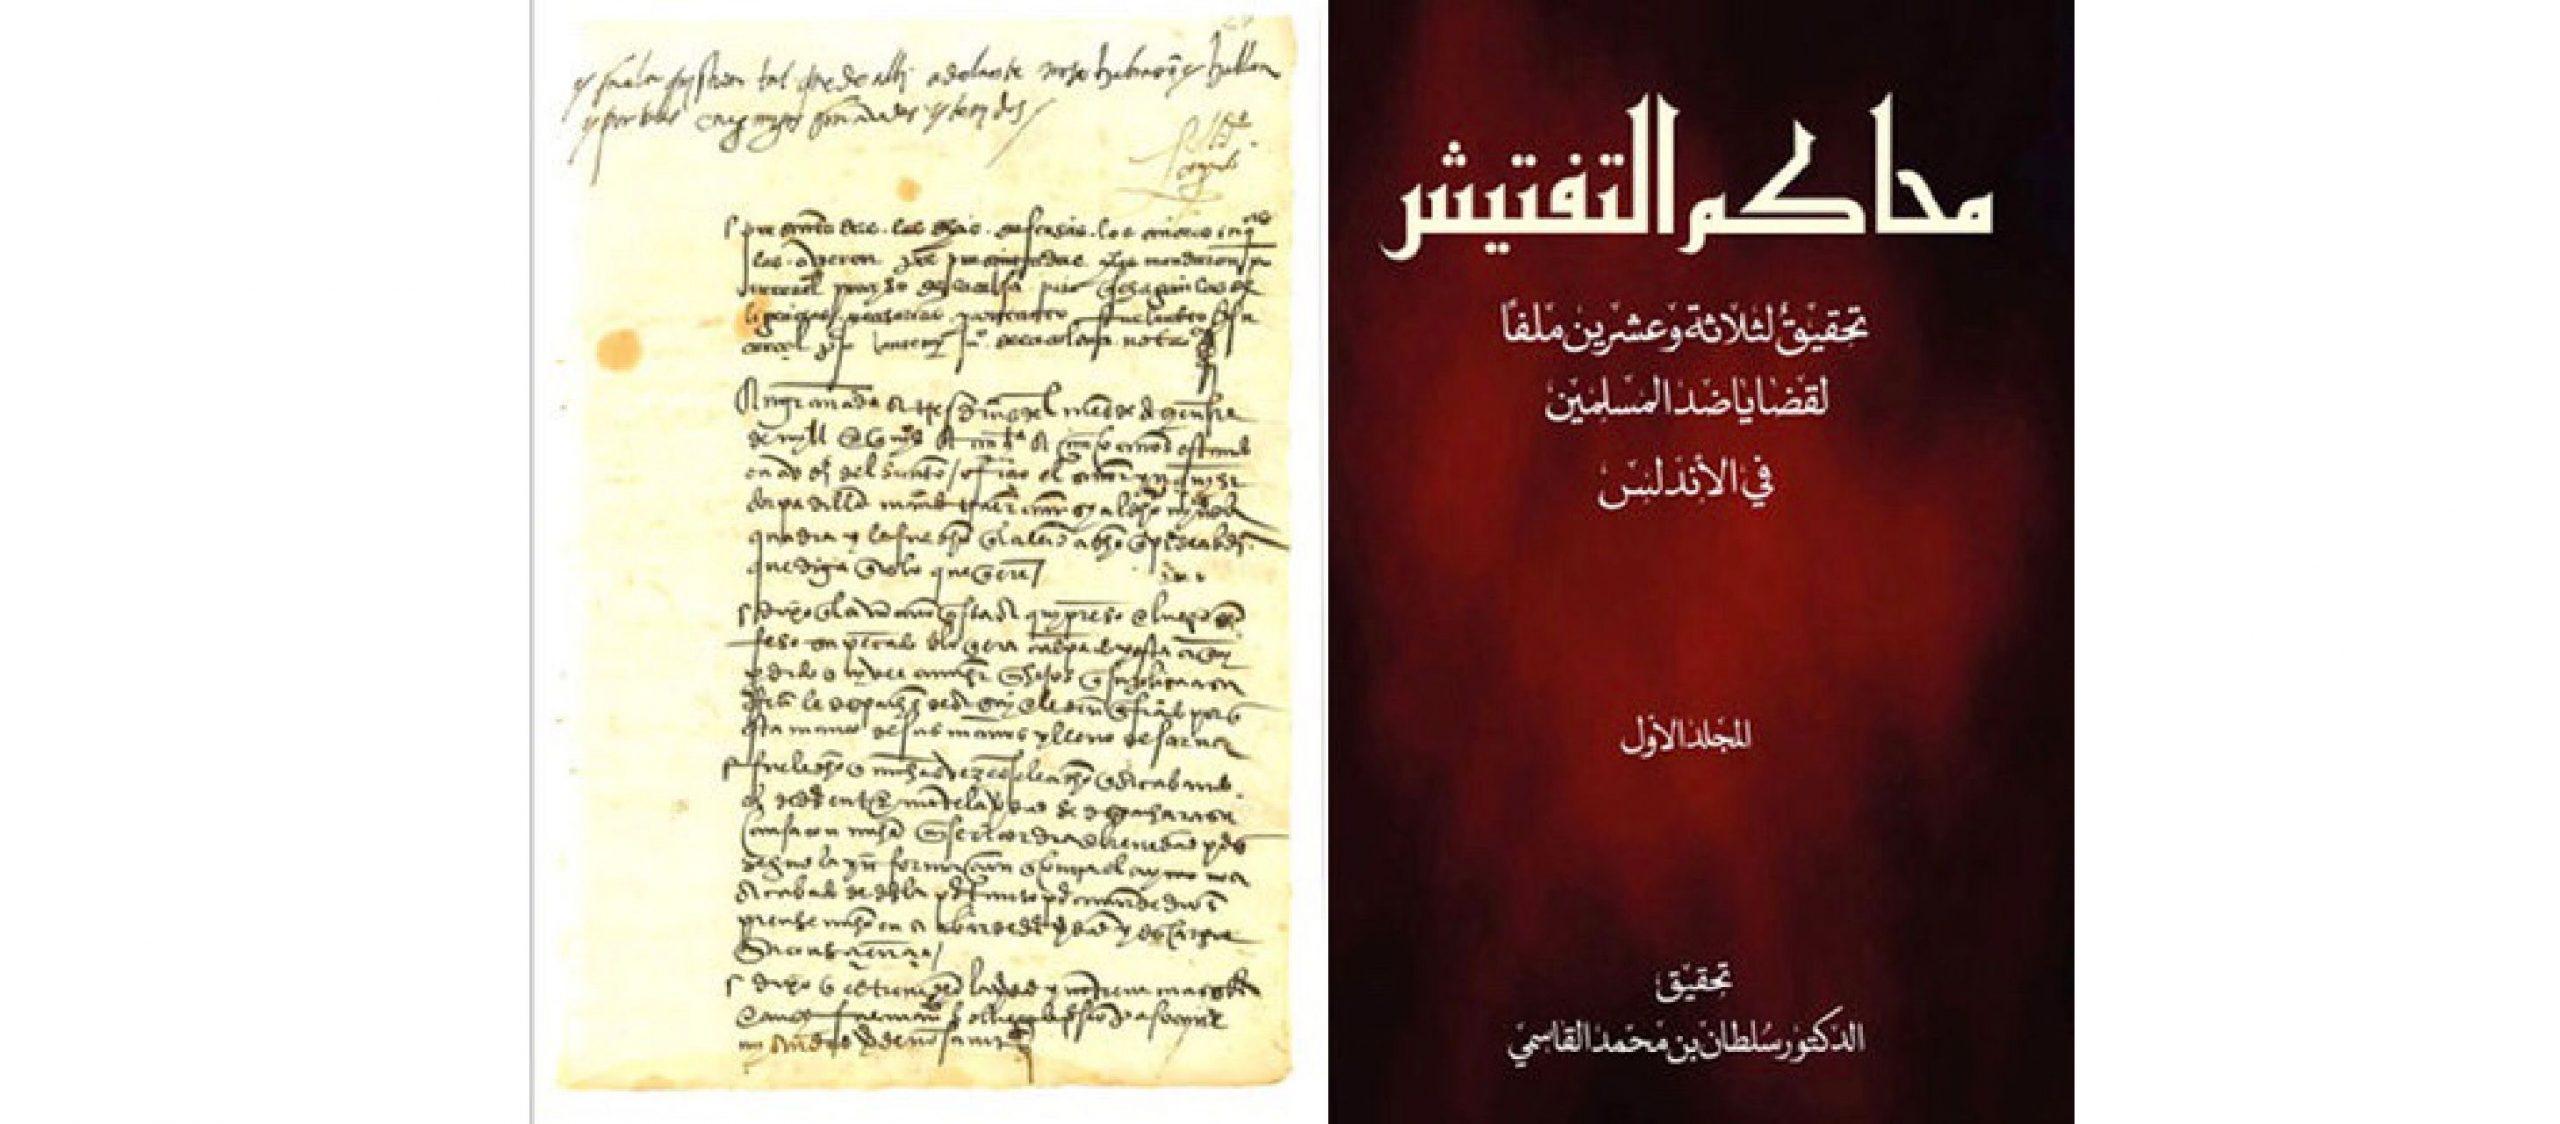 You are currently viewing سلطان القاسمي: «محاكم التفتيش» مخطوطات تكشف معاناة المسلمين في الأندلس